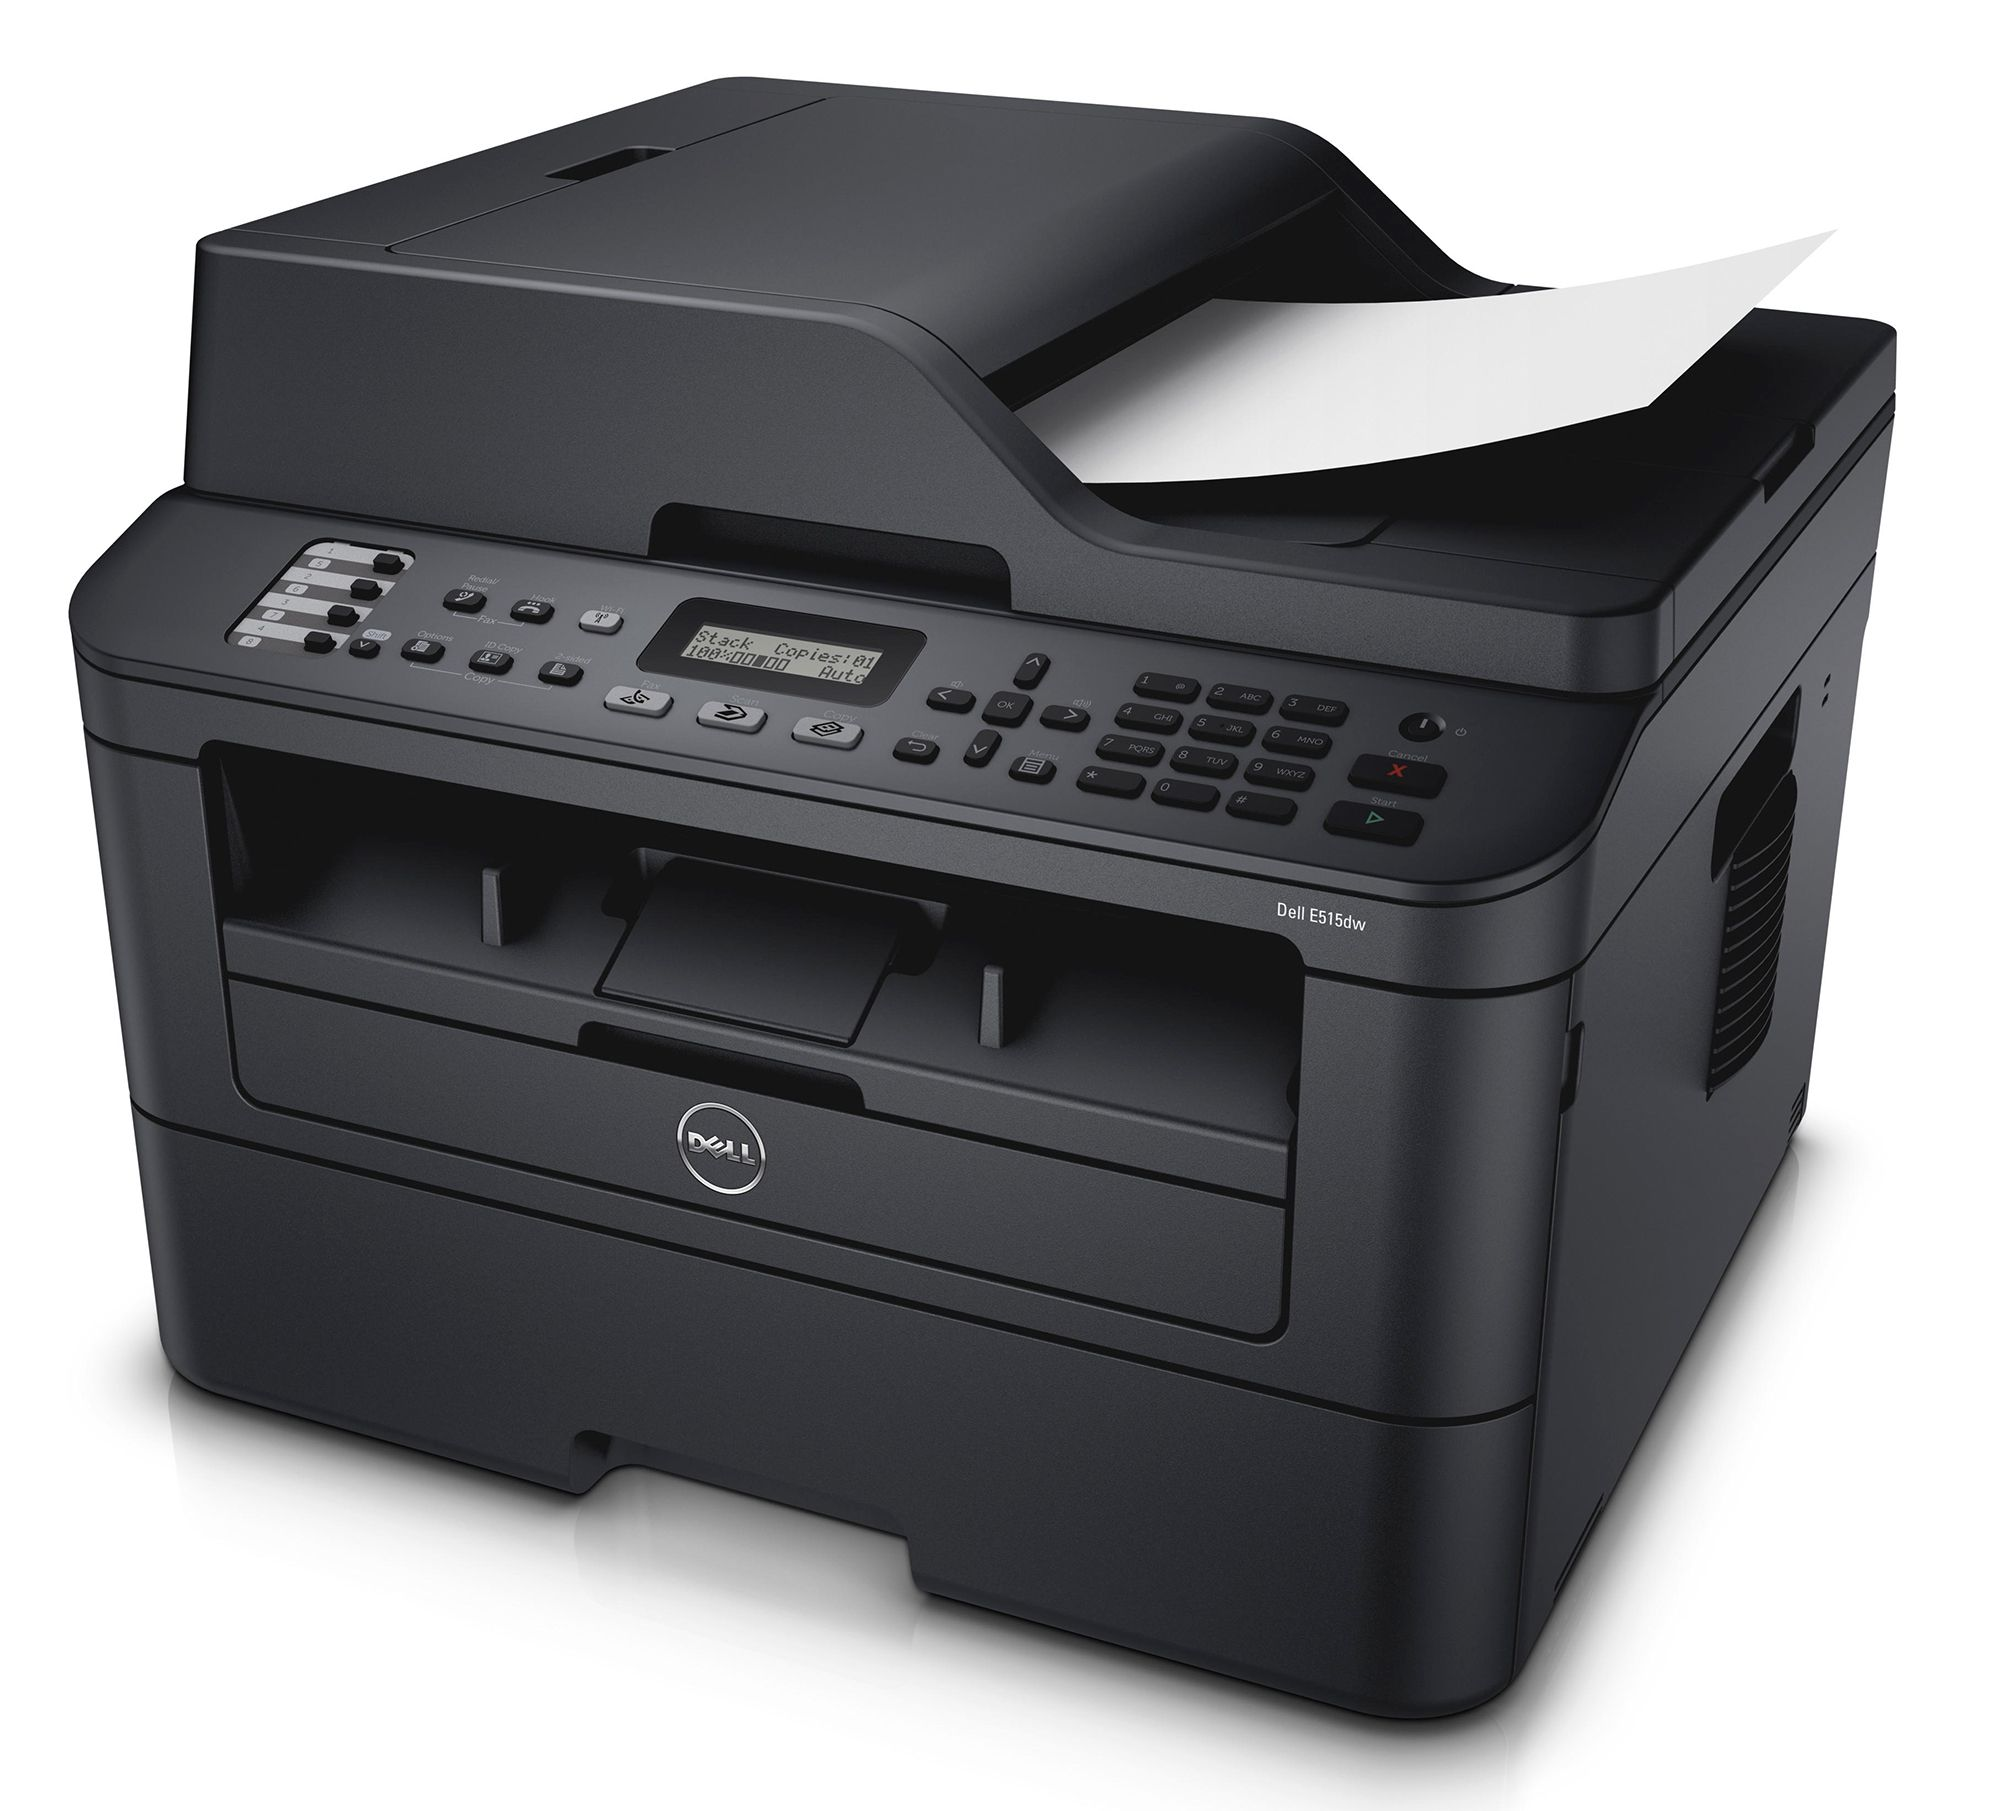 Multifunction color laser printer cost per page coloring for Hp color laserjet cost per page